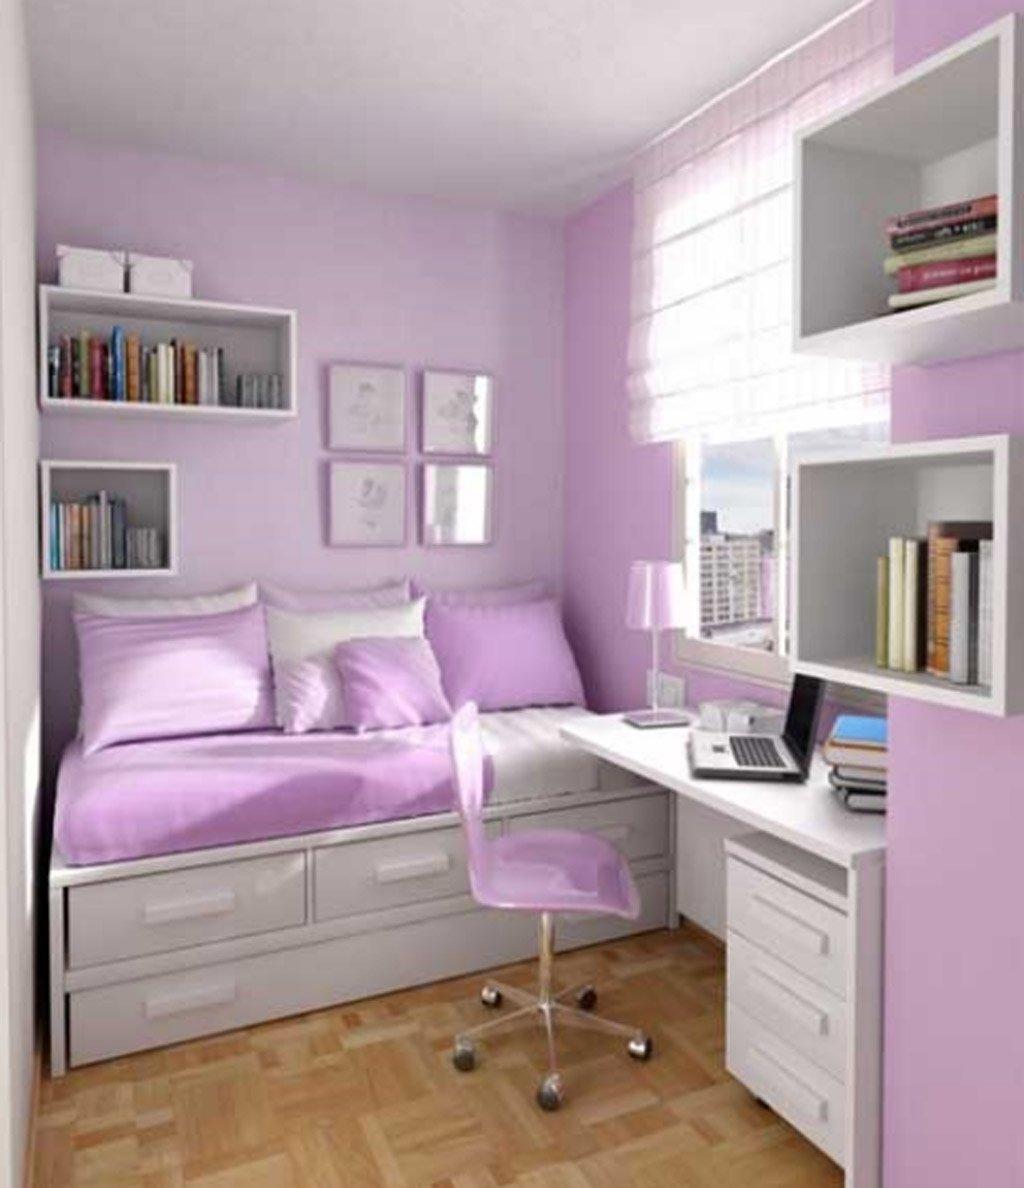 Gorgeous%2BSpace%2BSaving%2BIdeas%2Bfor%2BSmall%2BTeenage%2BDesks%2BBedroom%2BDecoration%2B%25288%2529 Gorgeous Space Saving Ideas for Small Teenage Desks Bedroom Decoration Interior